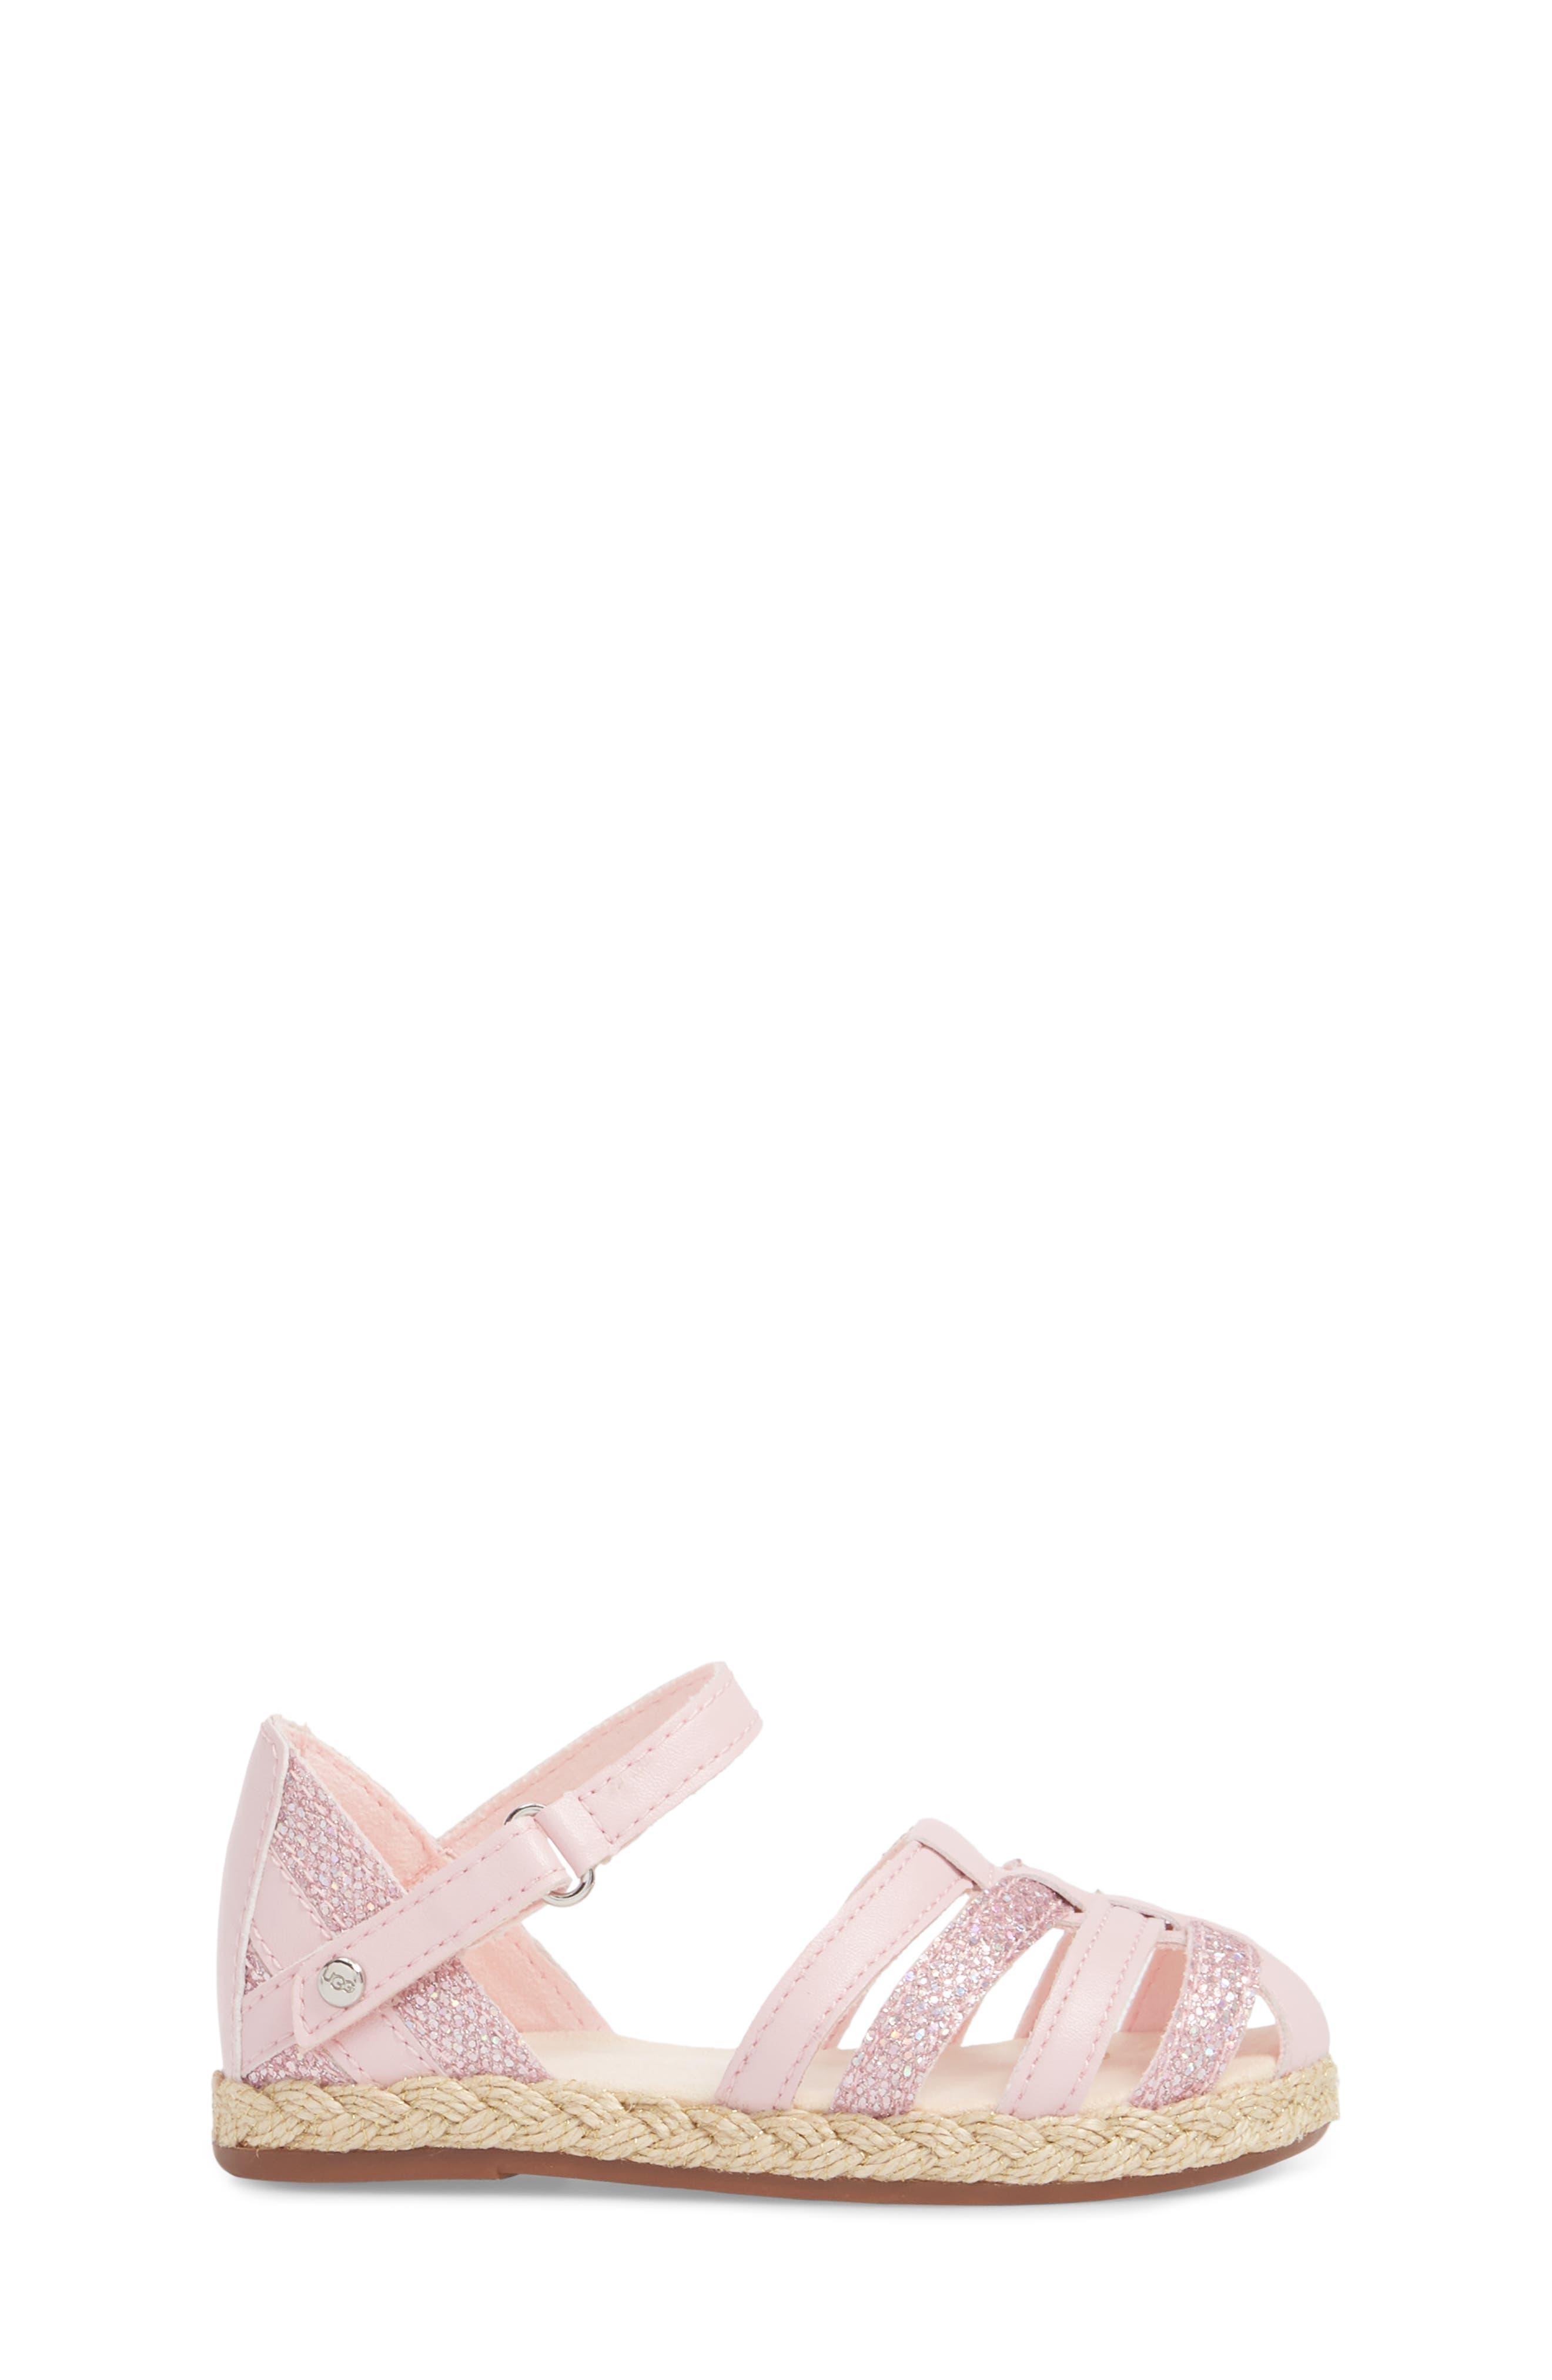 Matilde Espadrille Sandal,                             Alternate thumbnail 3, color,                             Seashell Pink